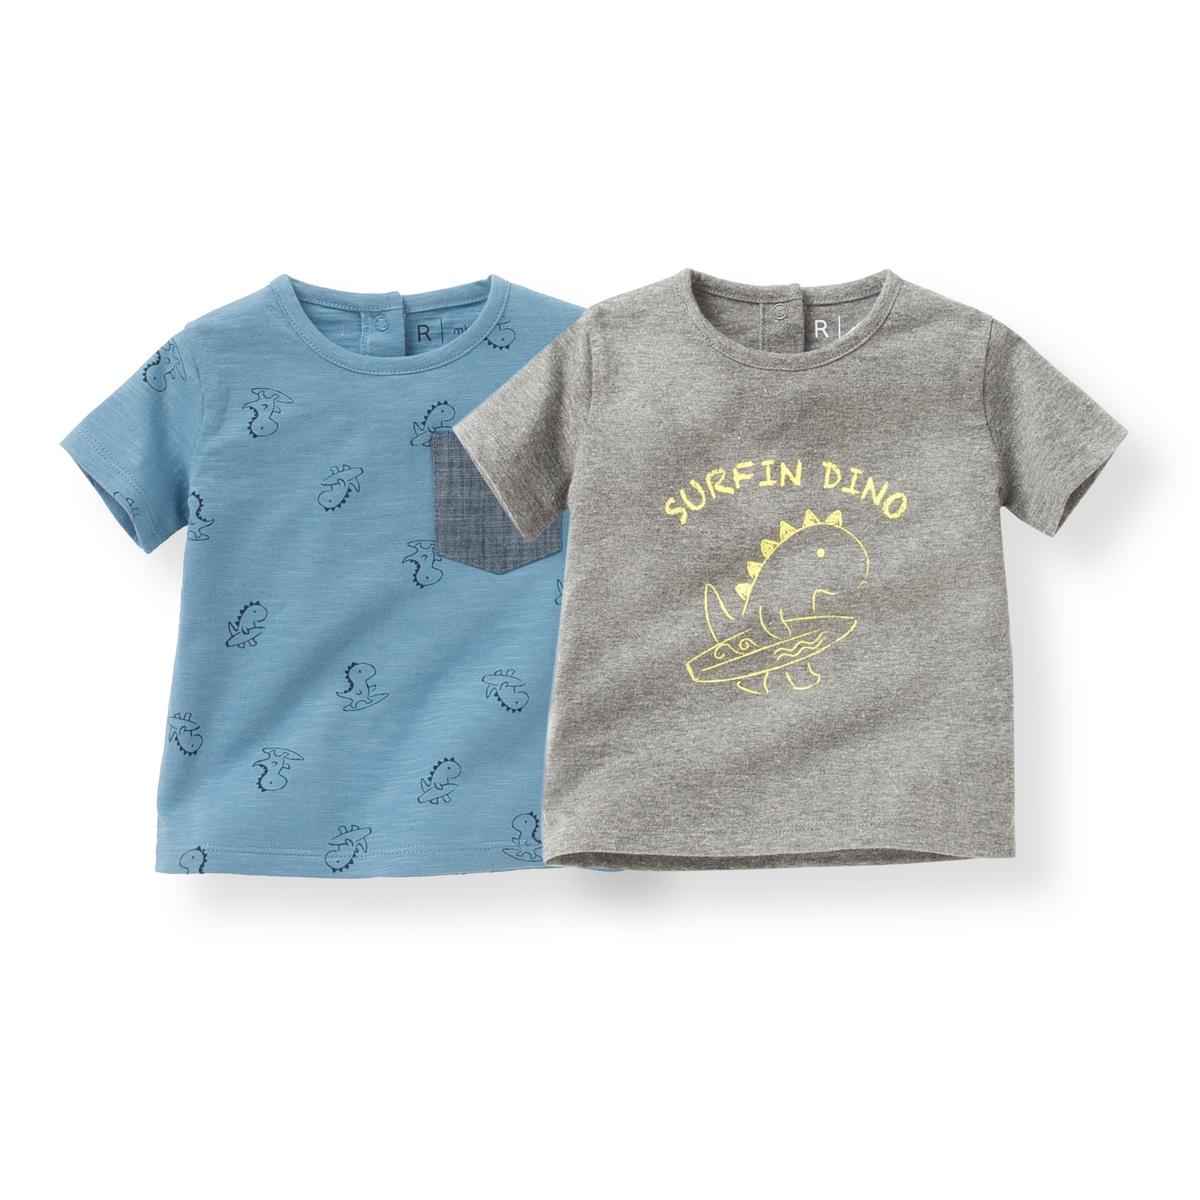 2 футболки с рисунком динозавр 1 мес-3 лет от La Redoute